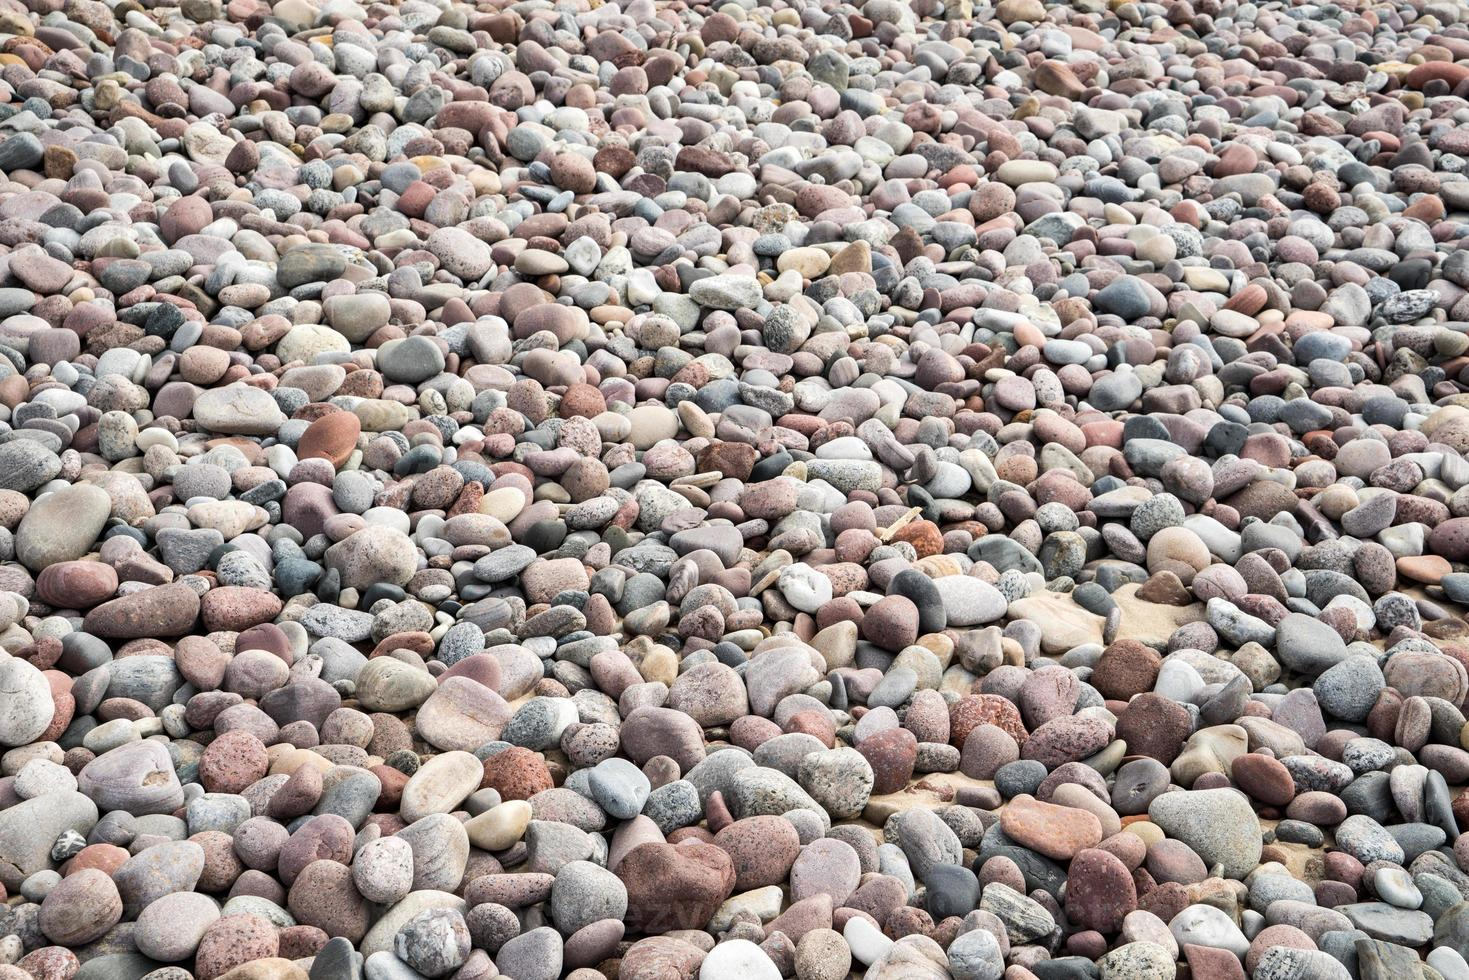 liten sten stenbakgrundsstruktur foto